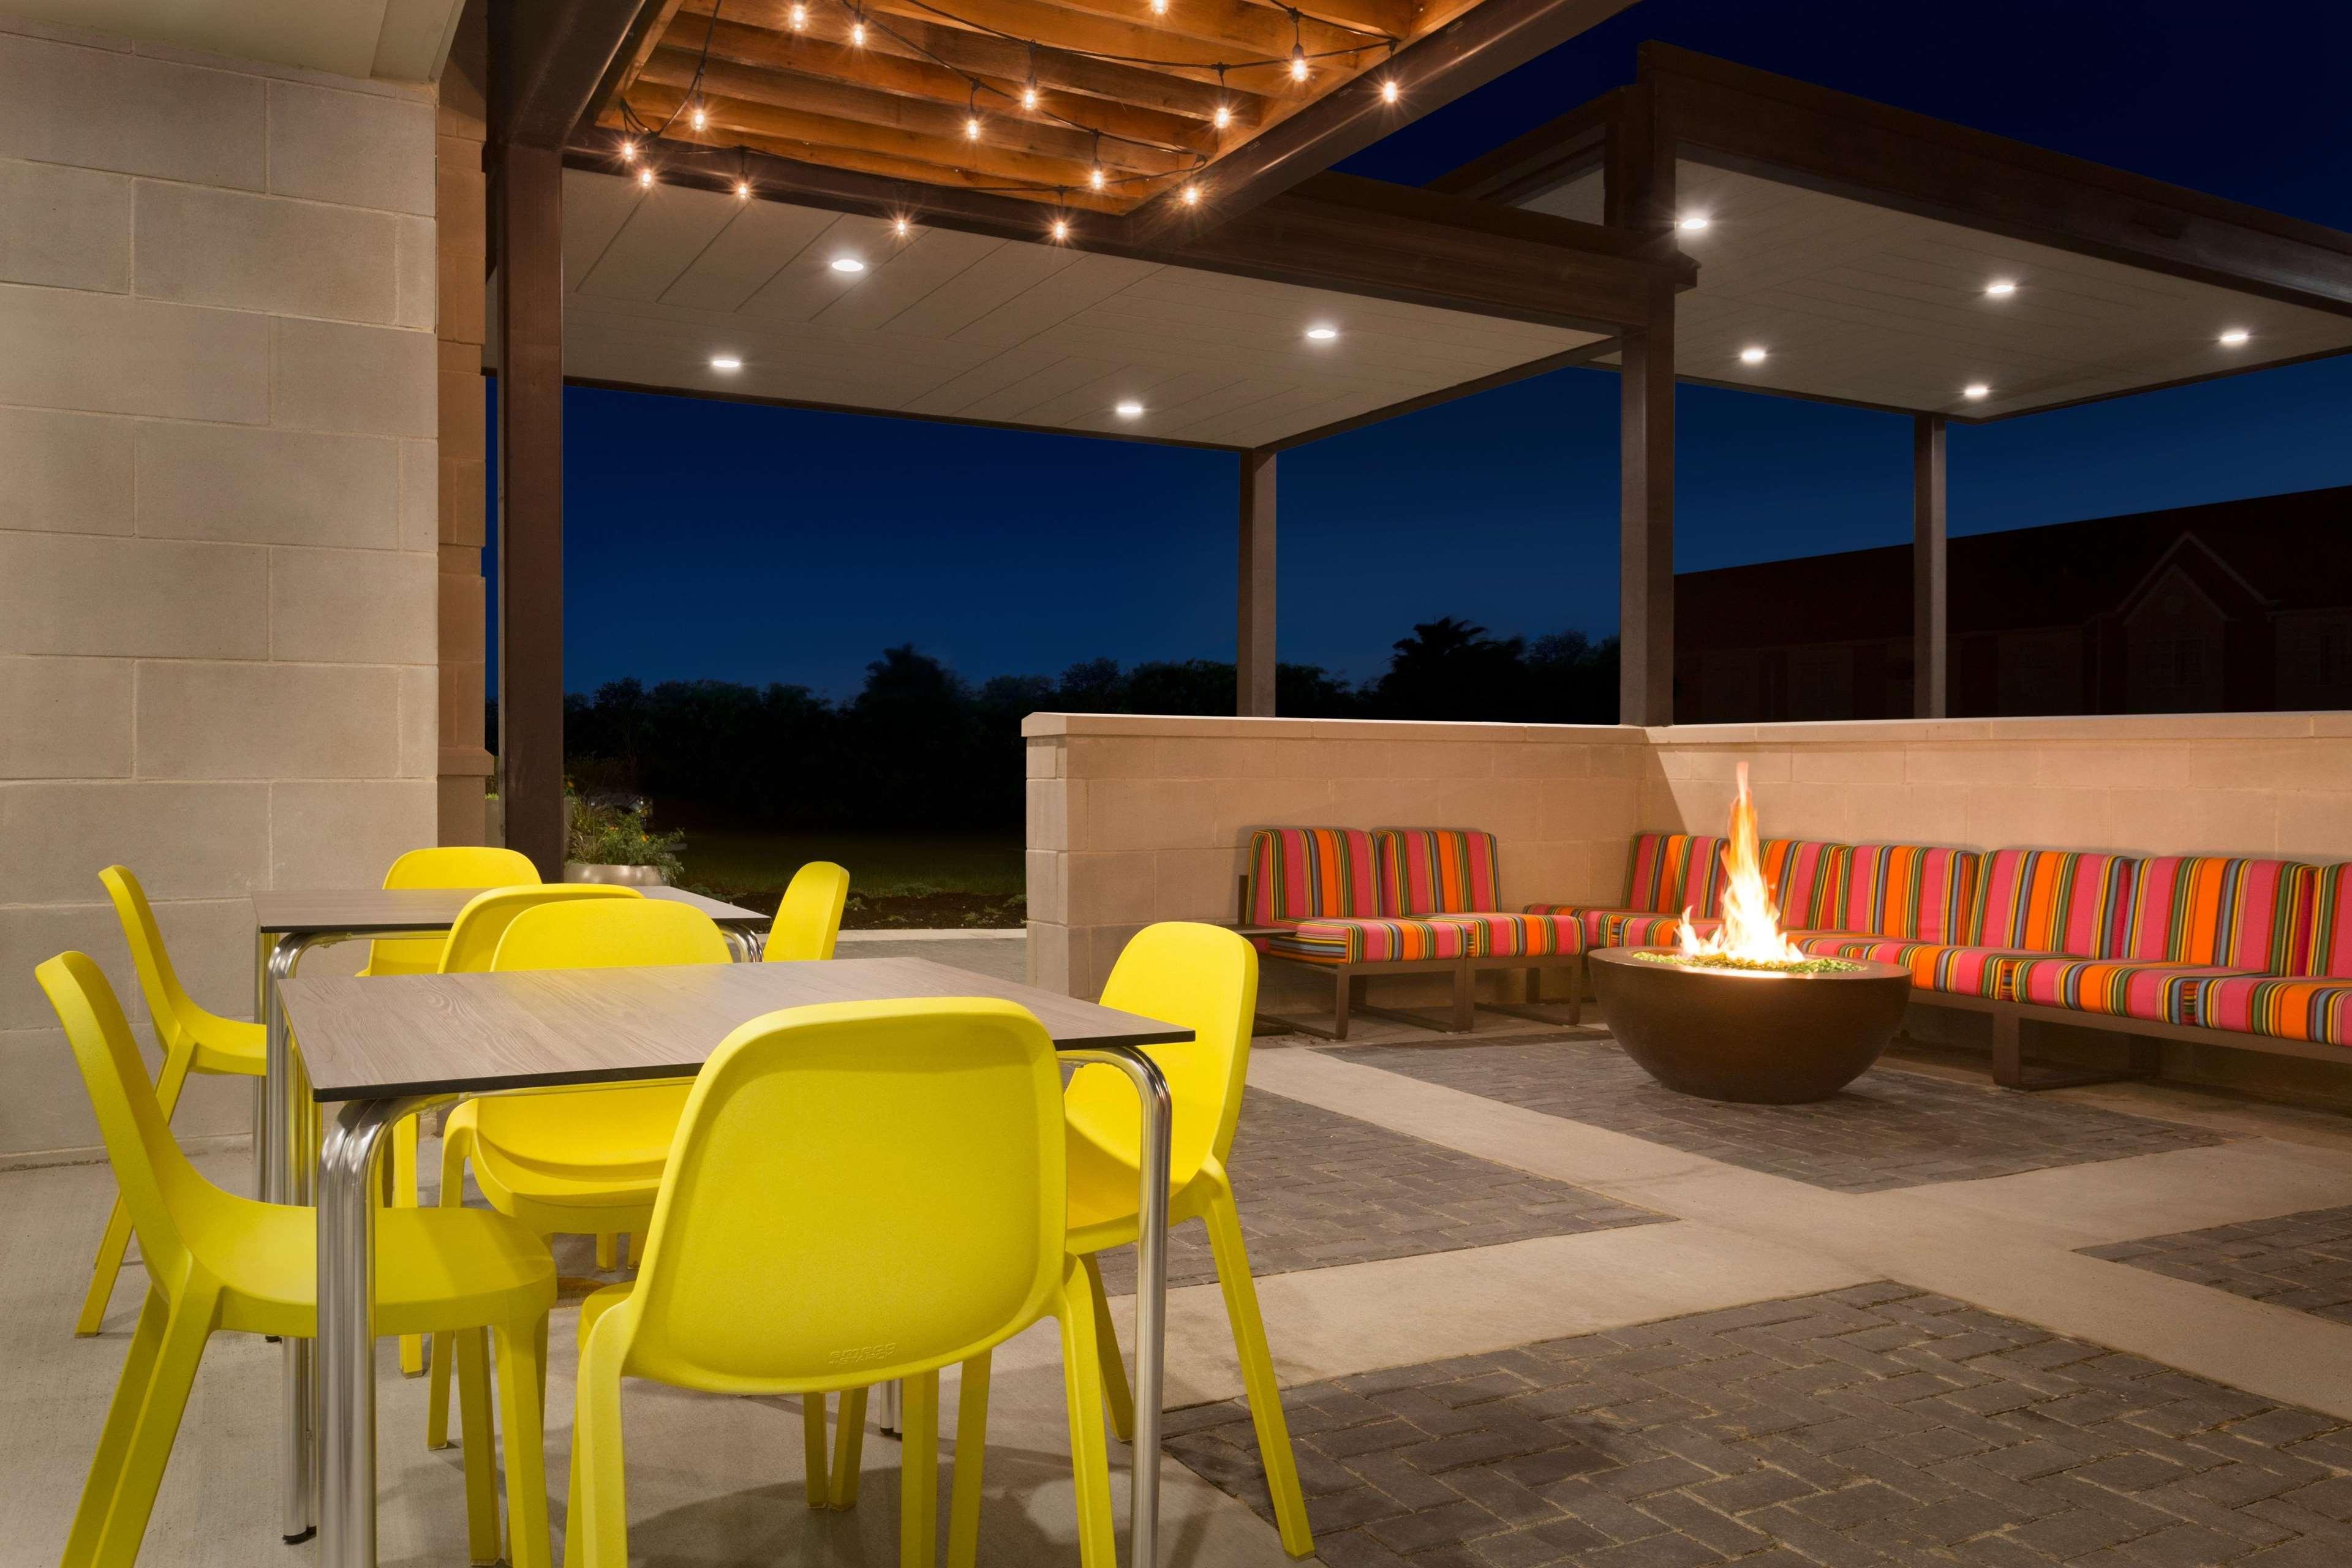 Home2 Suites by Hilton Florence Cincinnati Airport South image 3